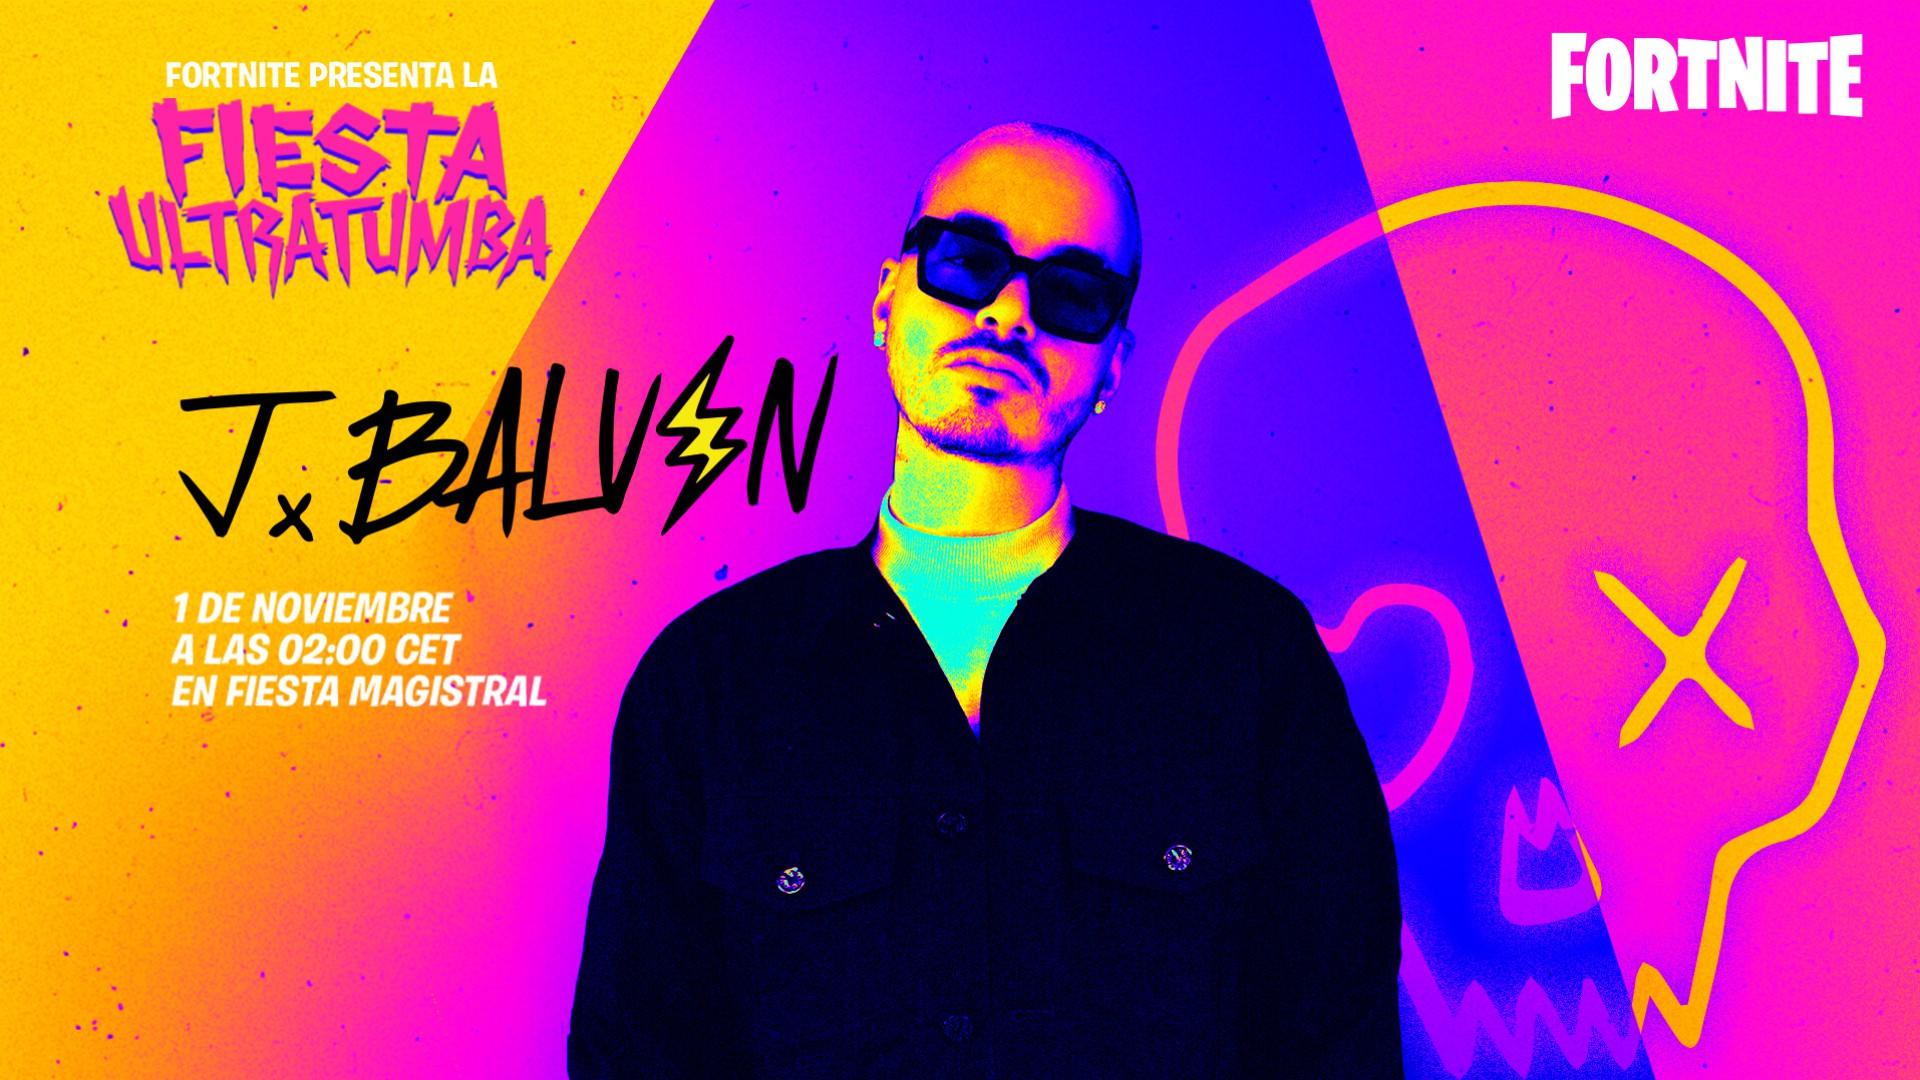 Fiesta Ultratumba JBalvin - Fortnitemares